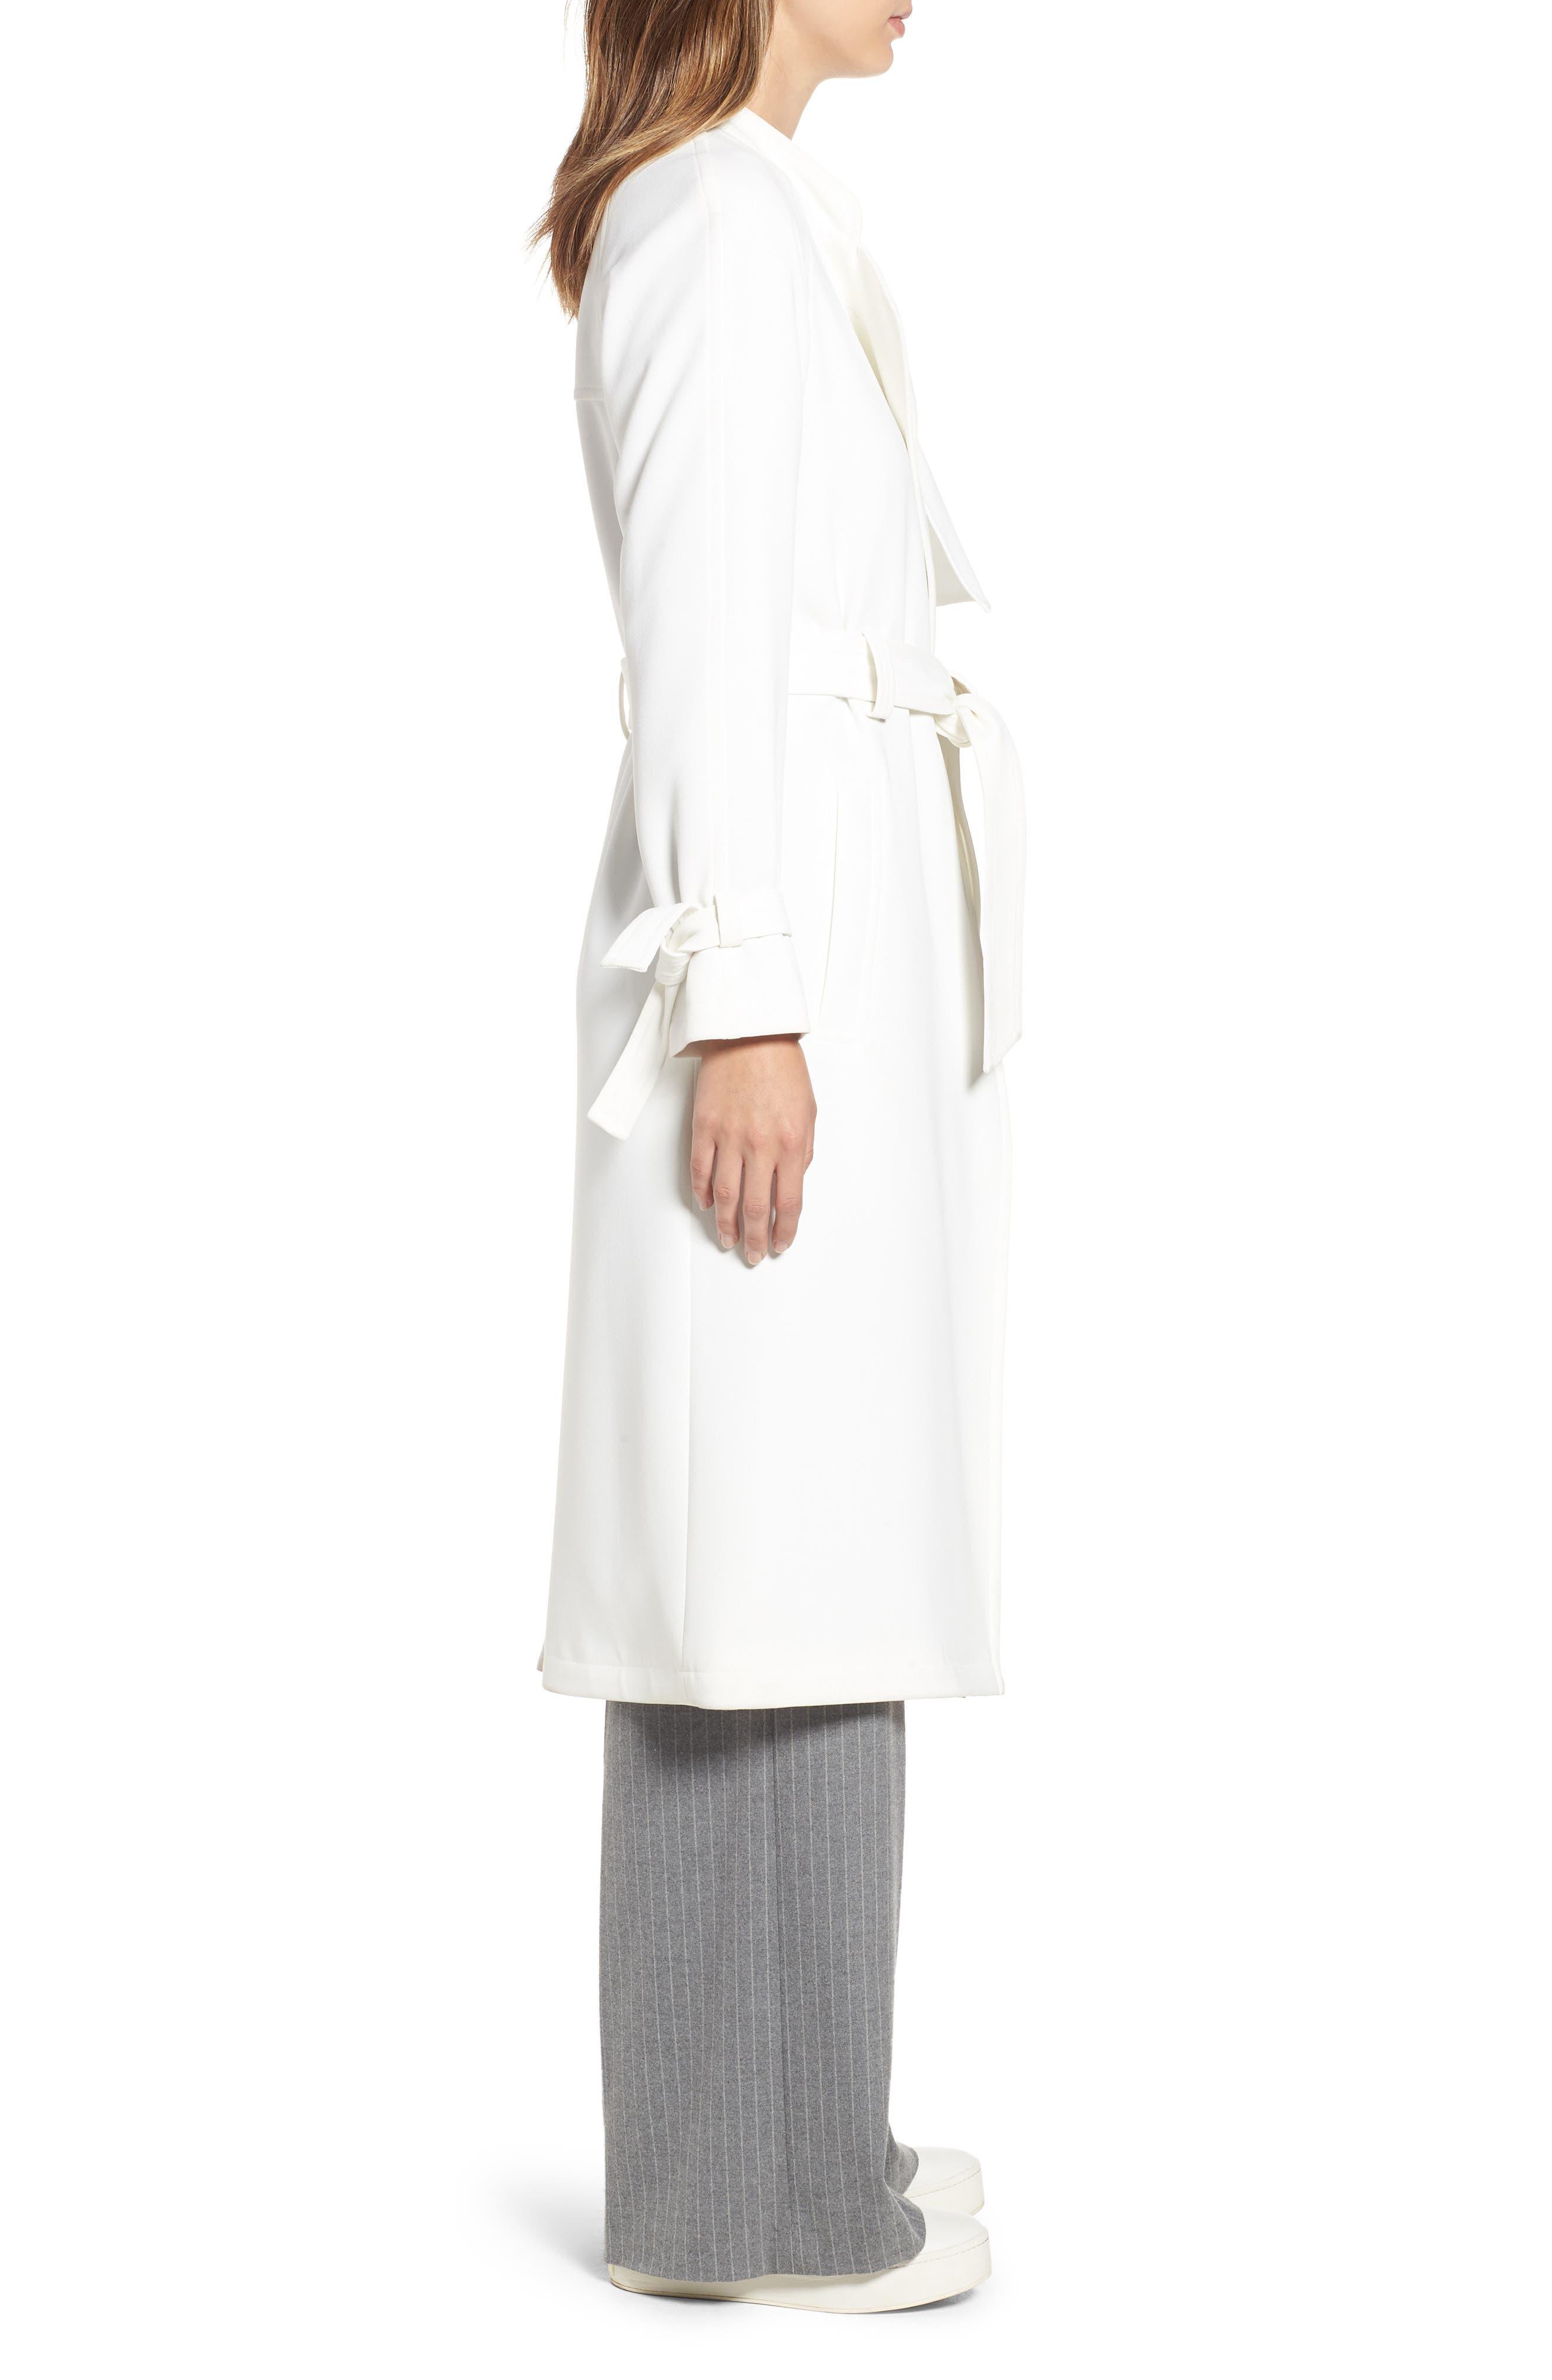 RACHEL RACHEL ROY, Luxe Crepe Trench Coat, Alternate thumbnail 3, color, WHITE